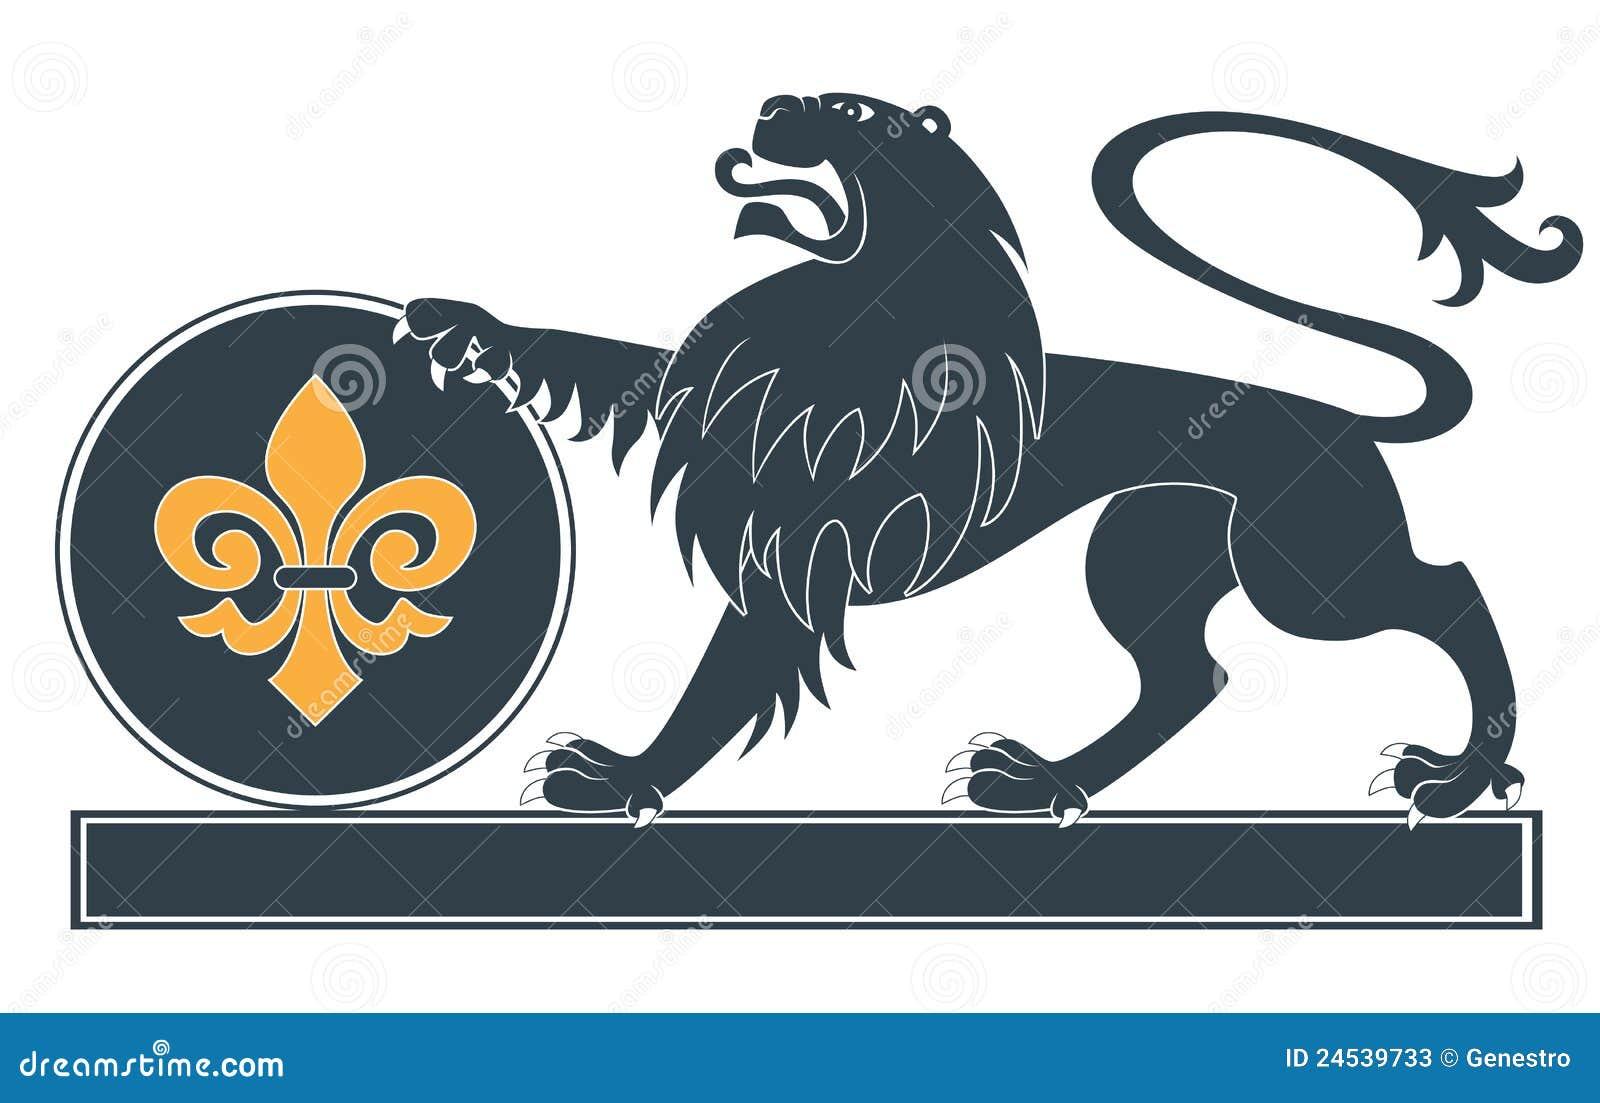 Heraldic силуэт льва